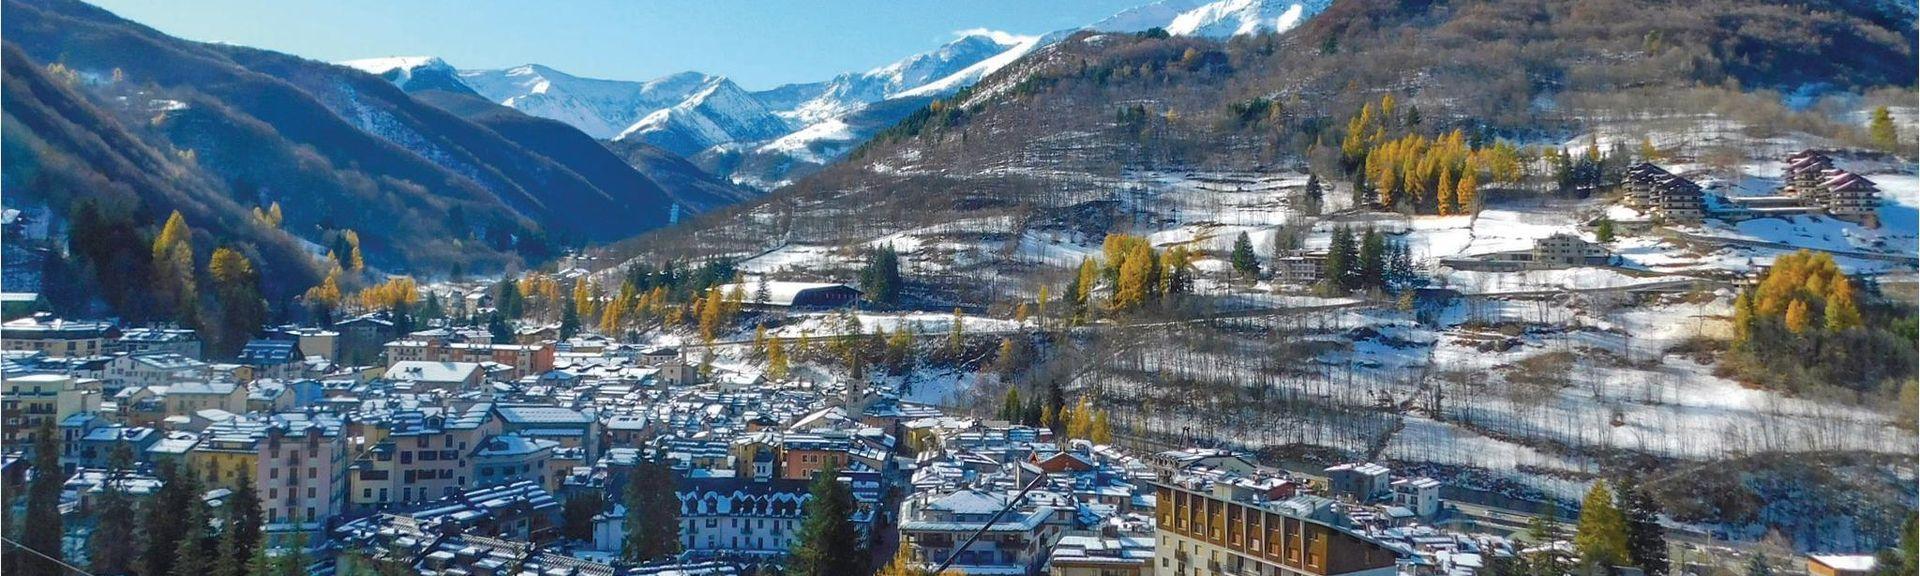 Boves, Piedmont, Italia